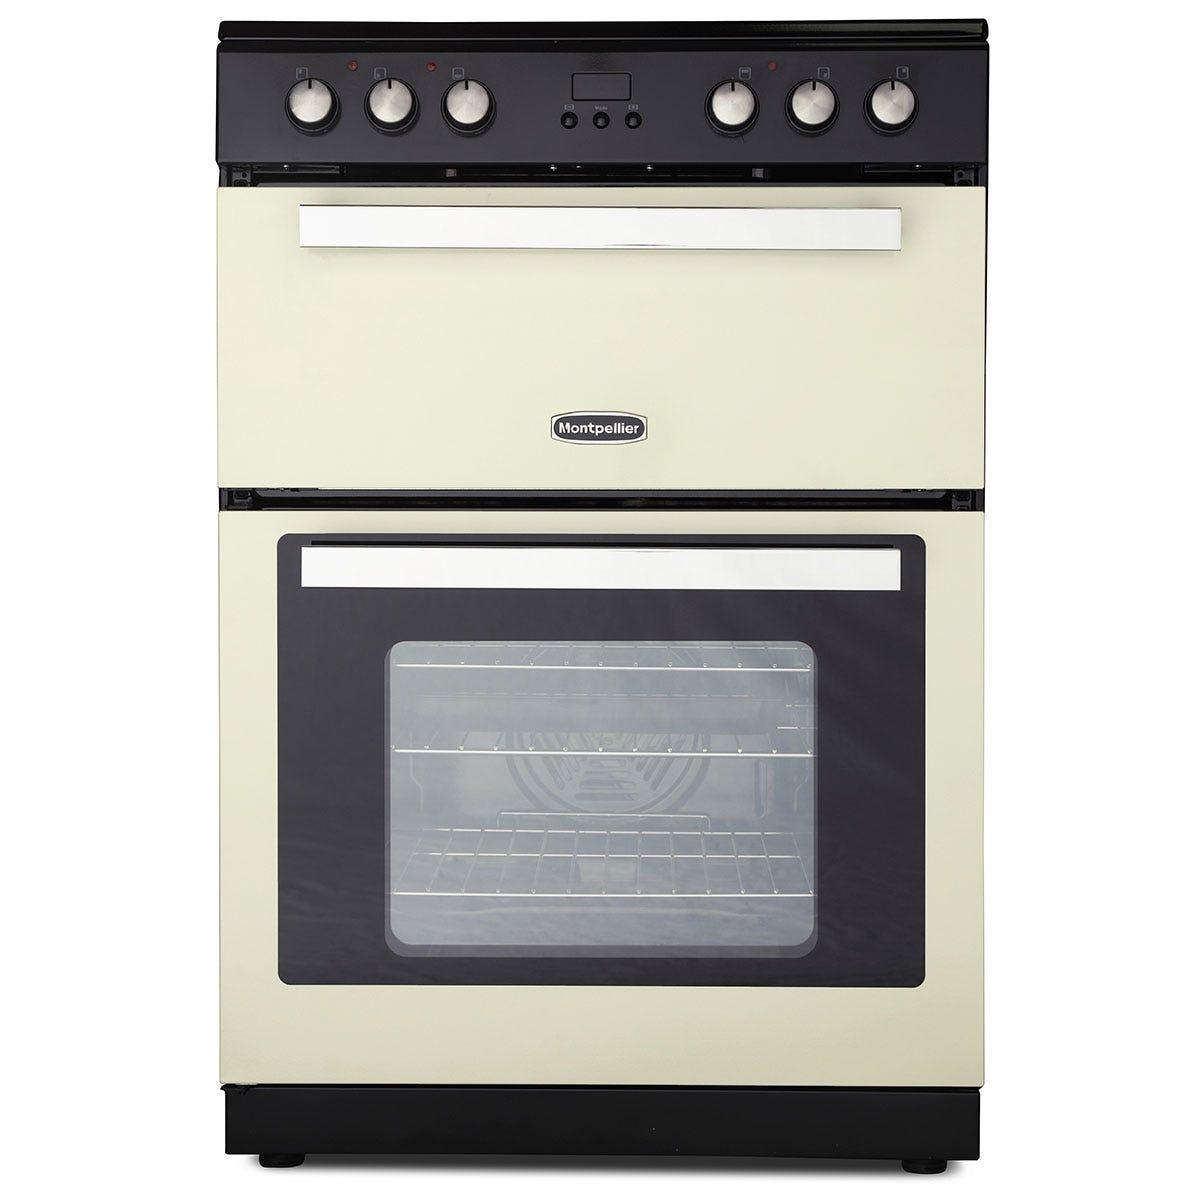 Montpellier RMC61CC 60cm Ceramic Mini Range Cooker with Double Oven - Cream